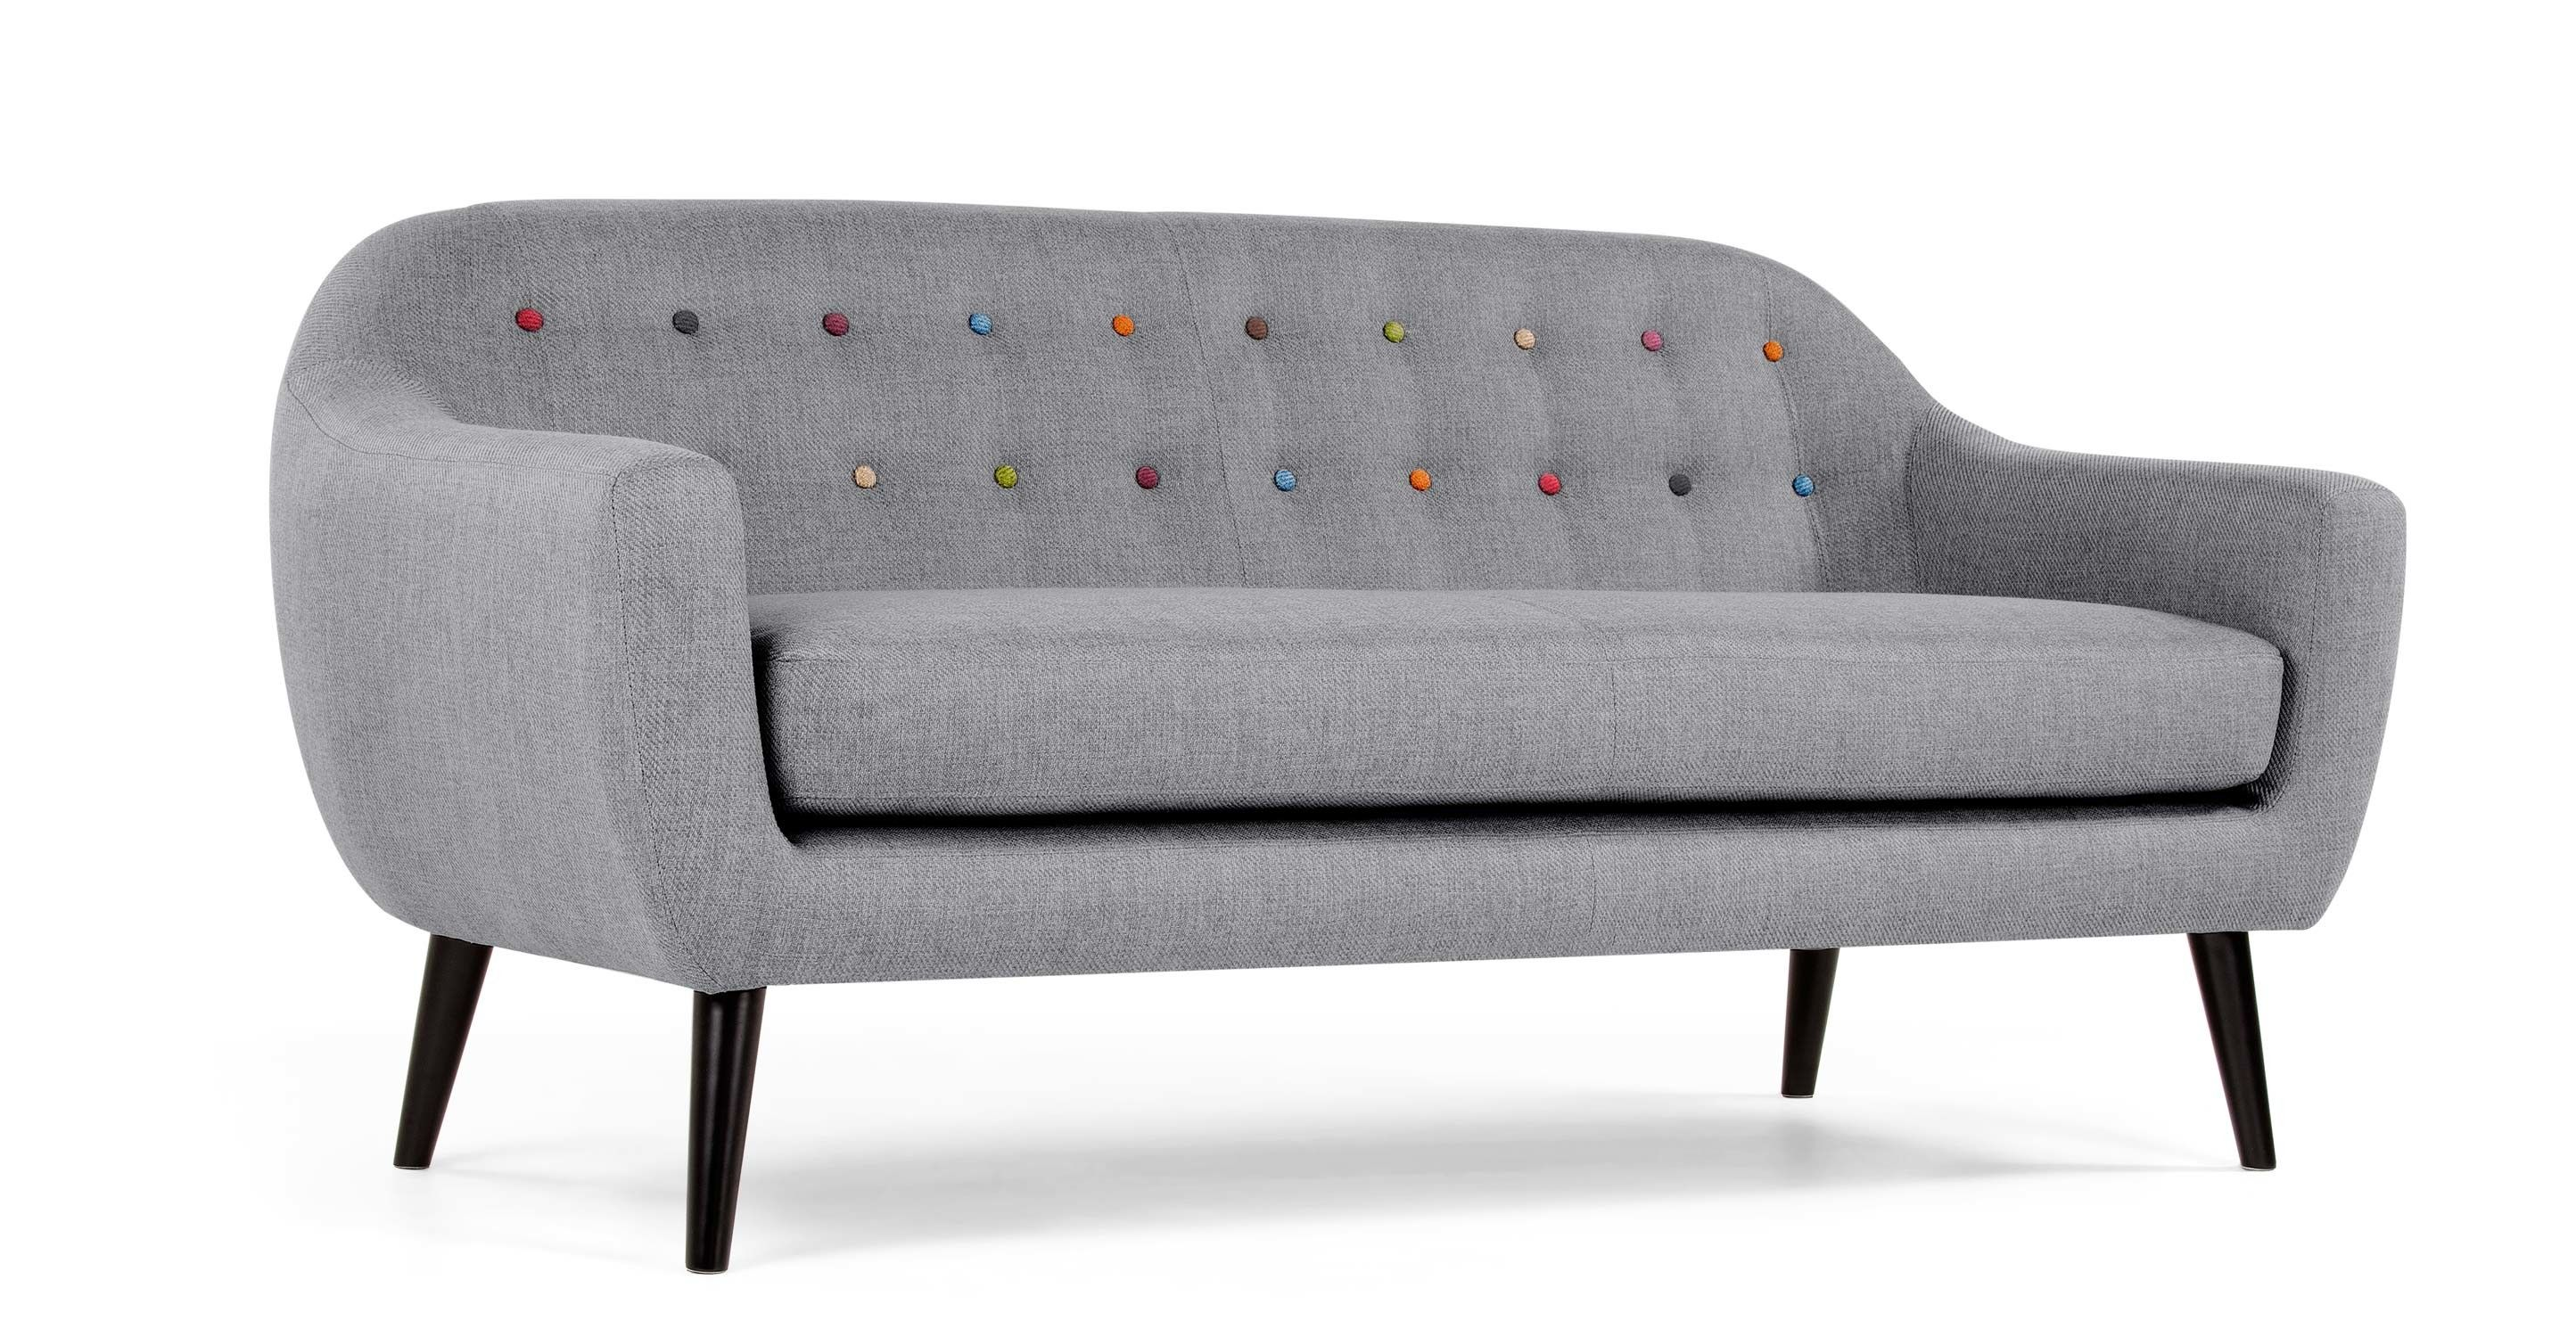 ritchie 3 sitzer sofa perlgrau mit bunten kn pfen interior style pinterest. Black Bedroom Furniture Sets. Home Design Ideas